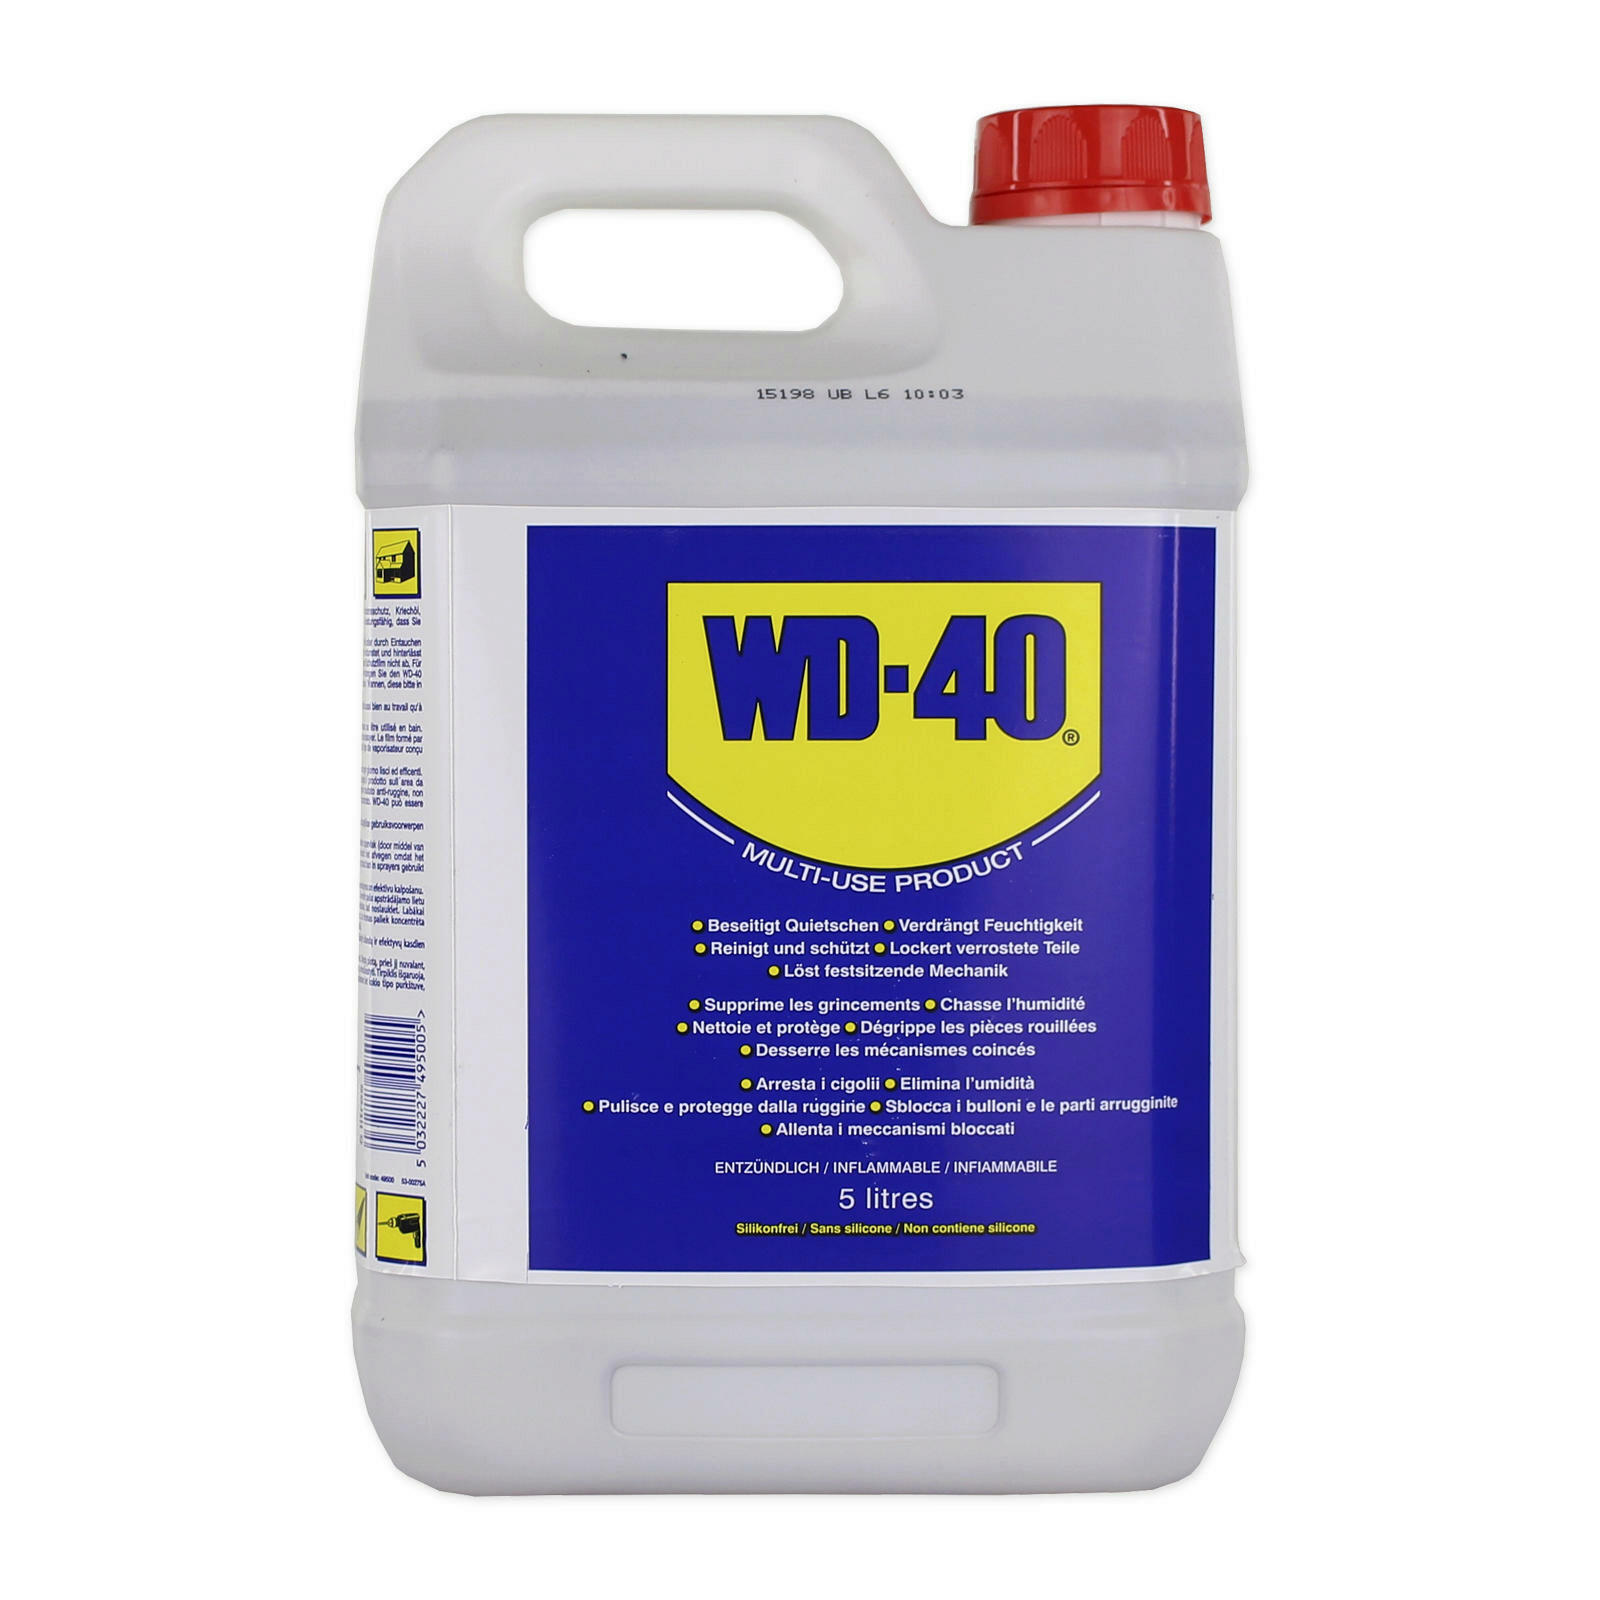 WD-40 Universalschmierstoff Kanister 5L